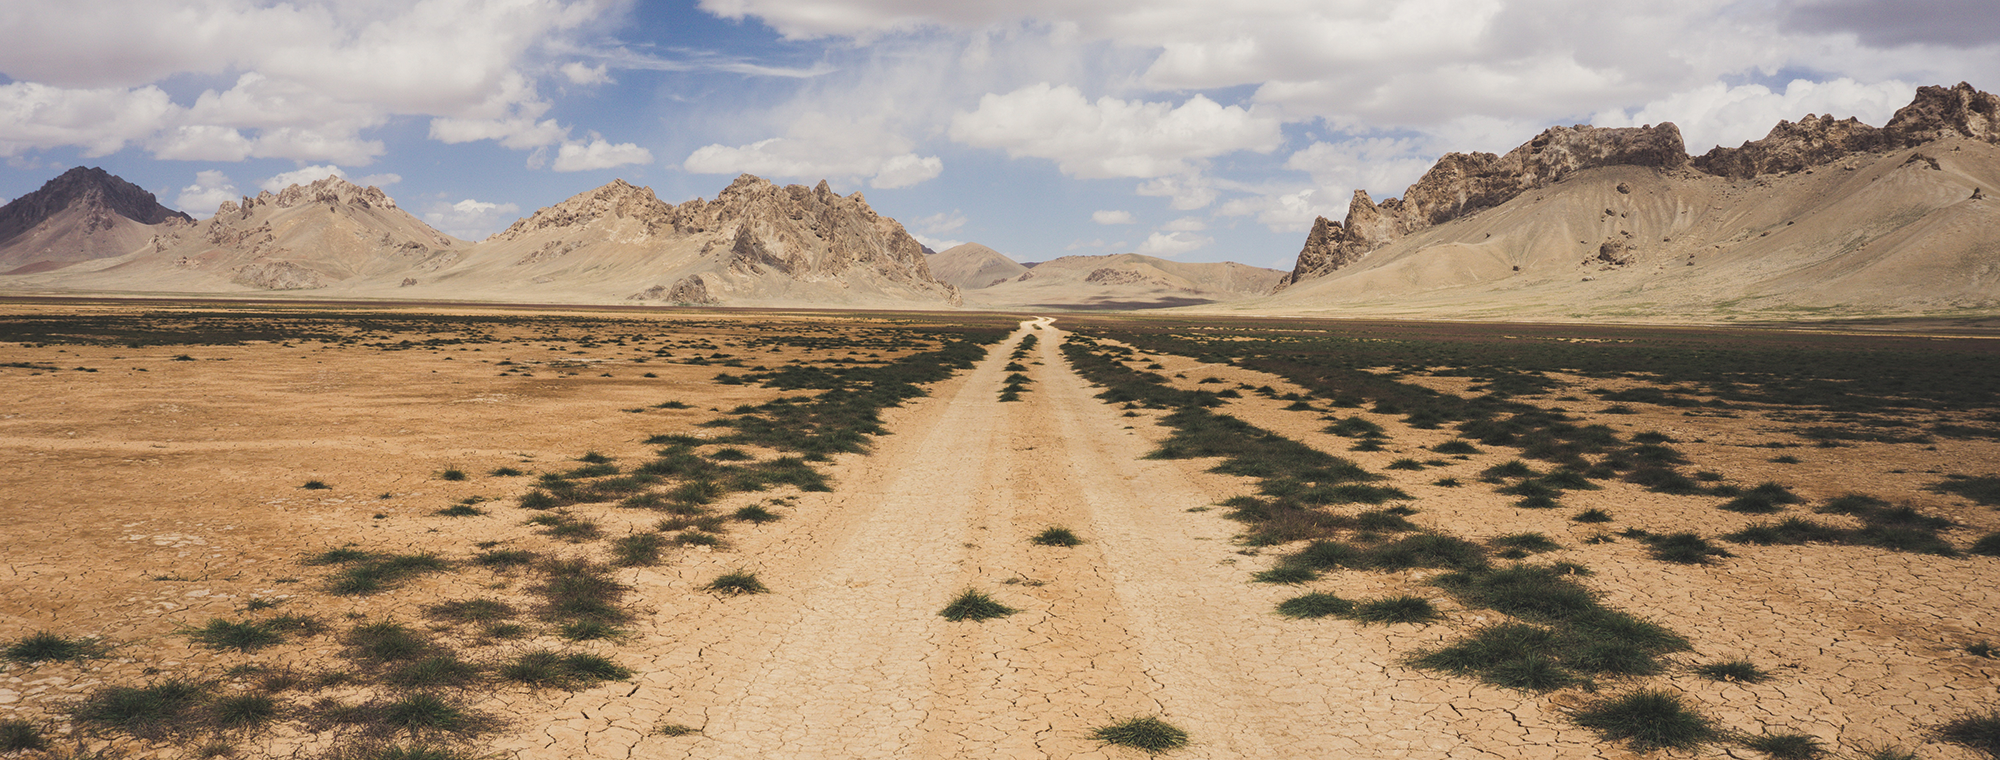 Landscape in the Pamir Mountains, Afghanistan. Image: Huib Scholten/Unsplash